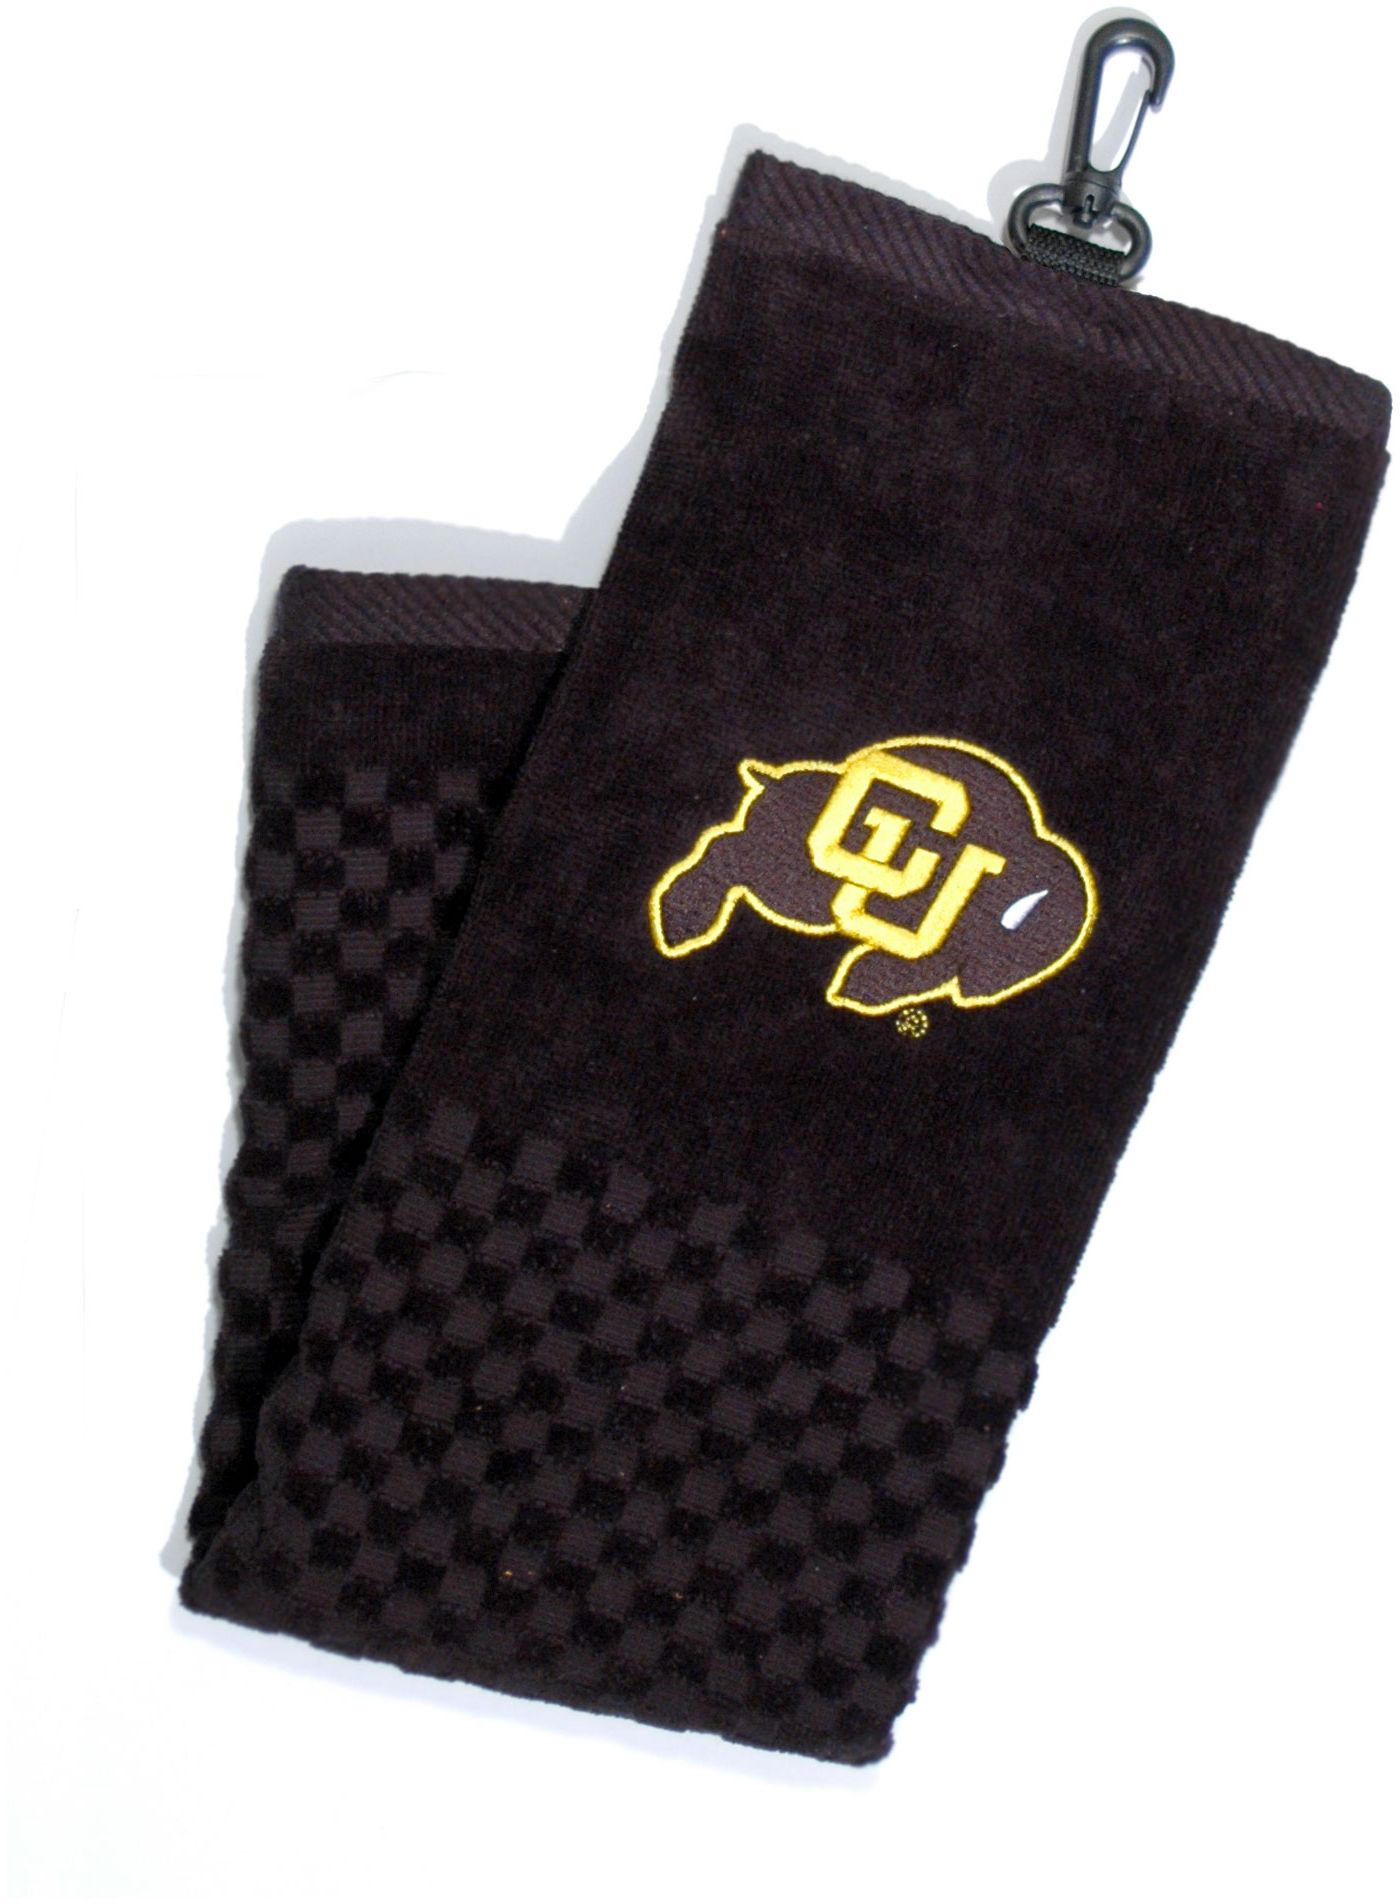 Team Golf Colorado Buffaloes Embroidered Towel